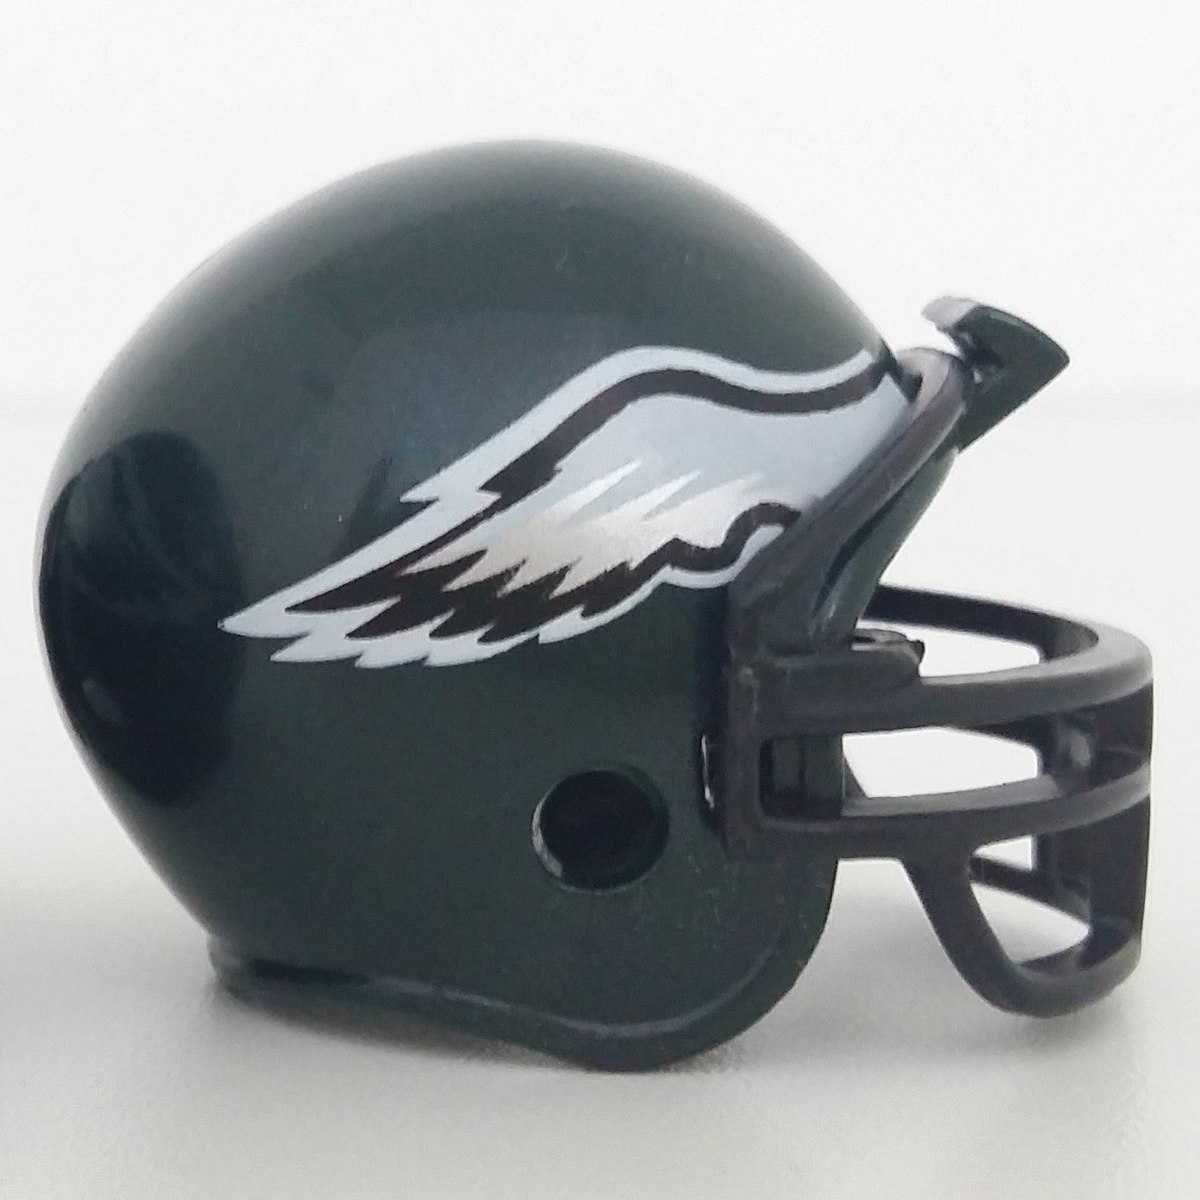 mini capacete futebol americano - nfl - philadelphia eagles. Carregando zoom . a1dece947a720